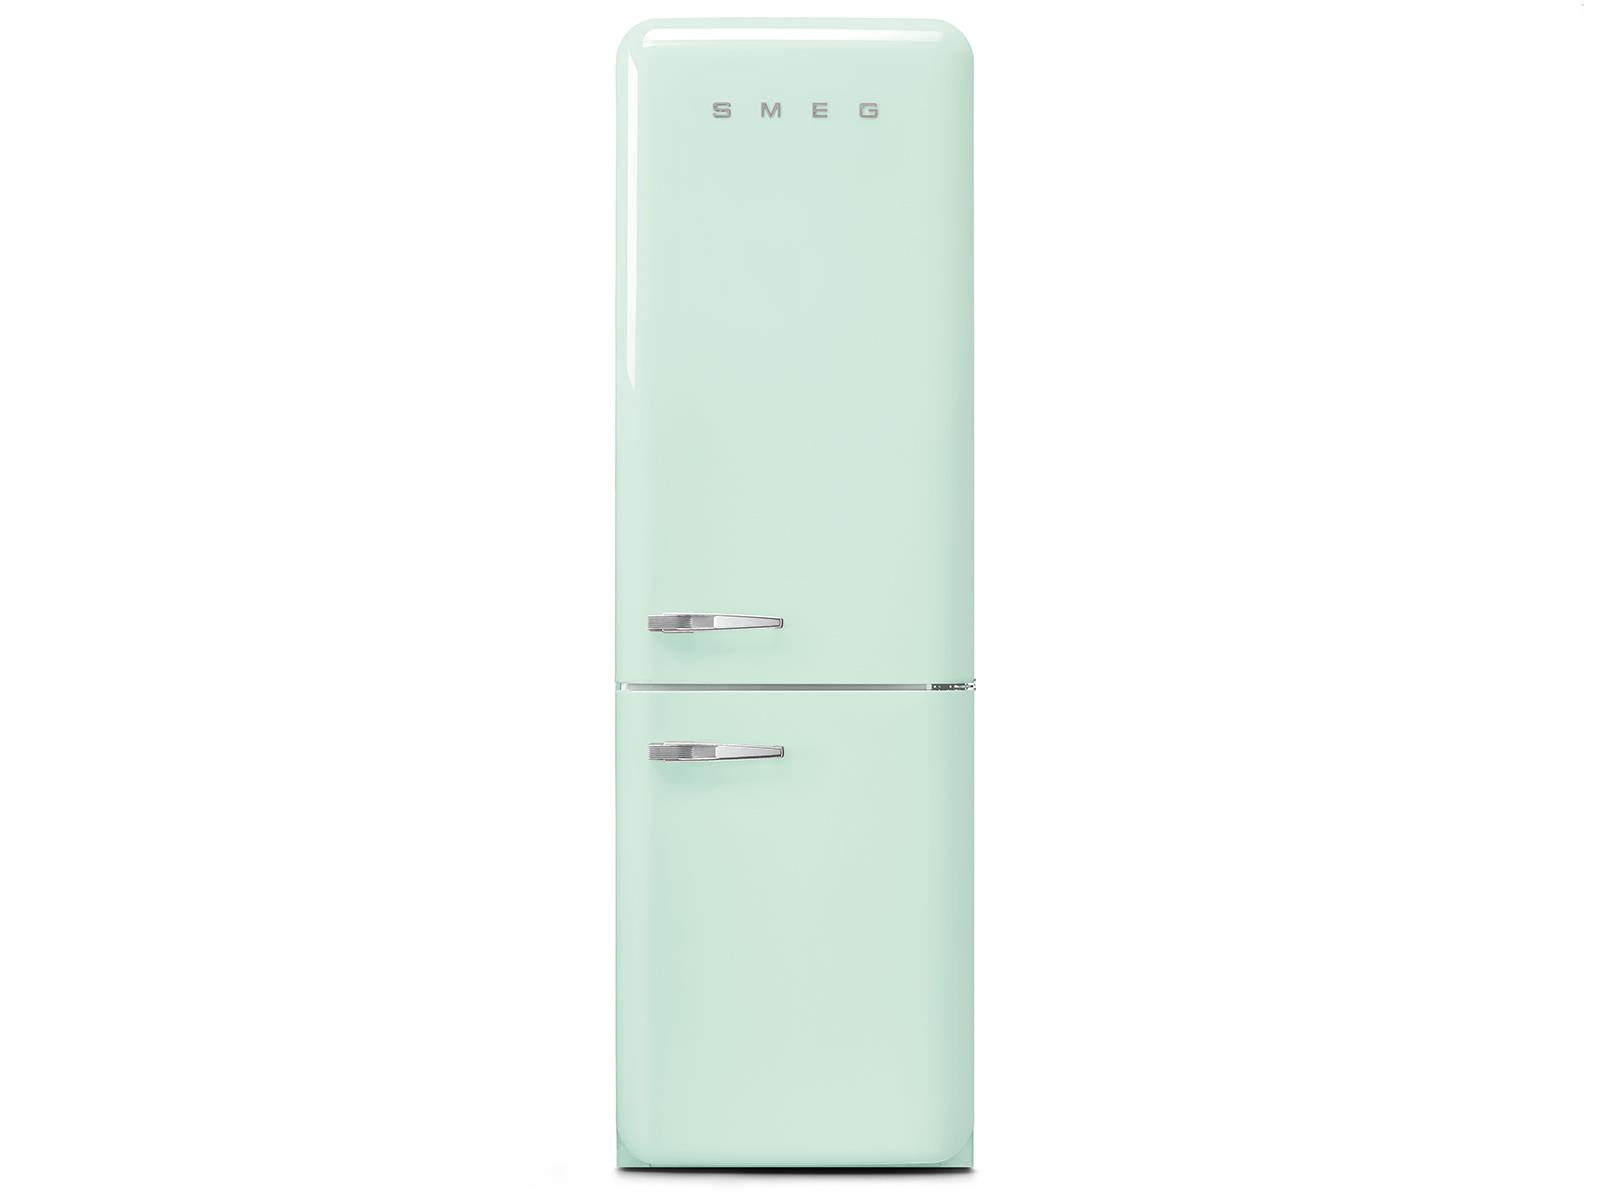 Smeg Kühlschrank Db : Smeg fab32rpg3 kühl gefrierkombination pastellgrün